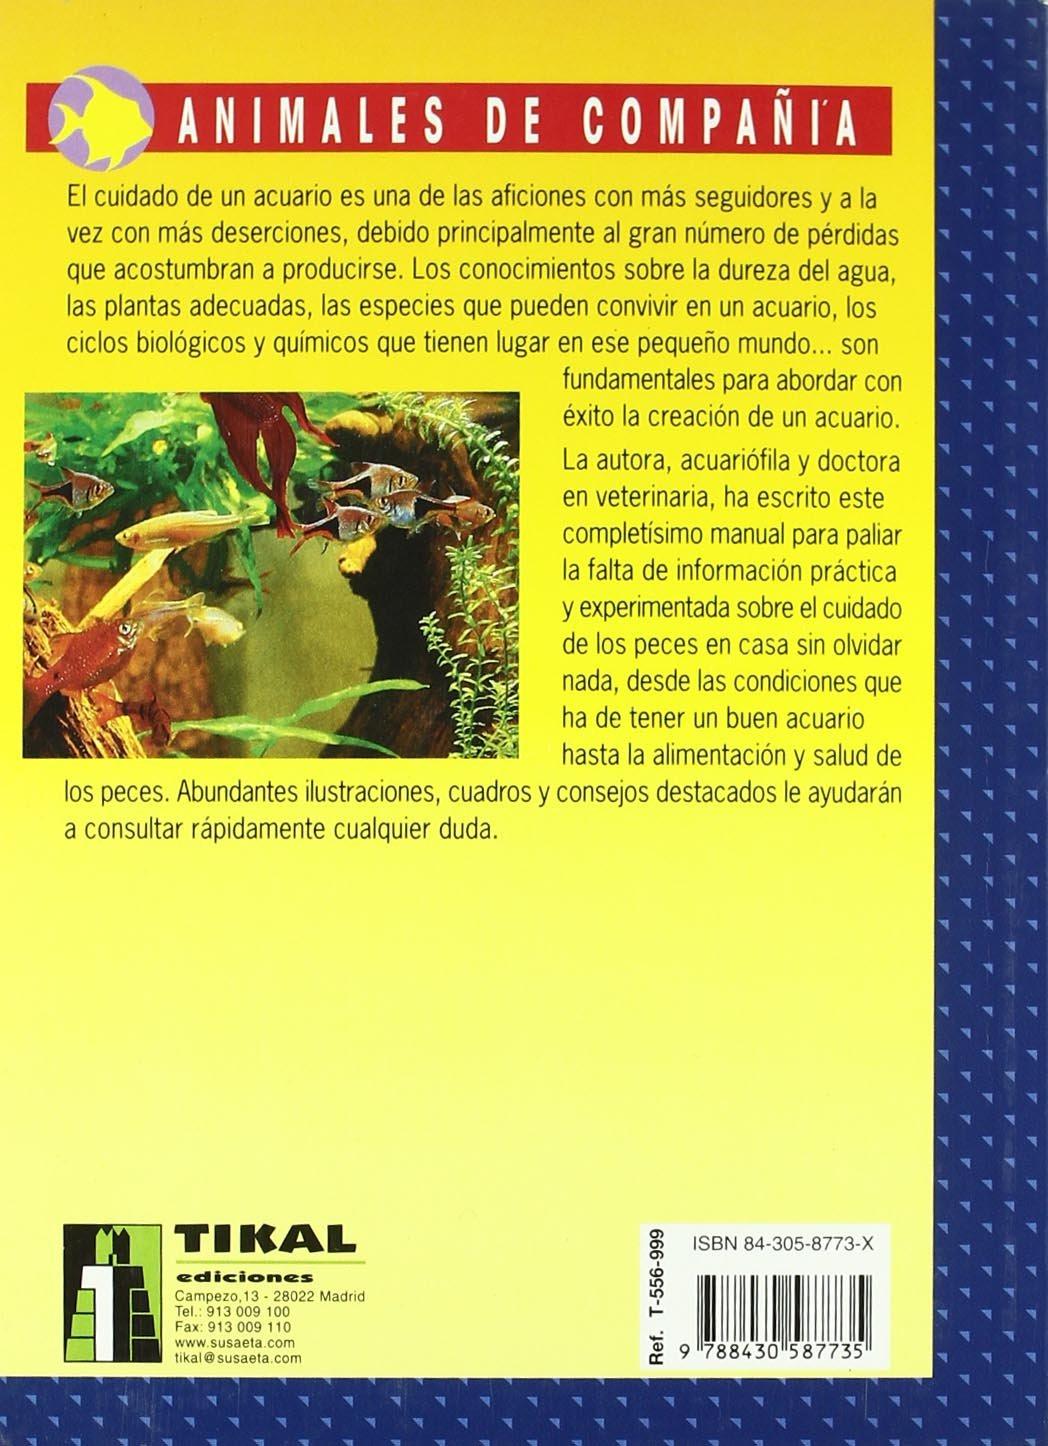 El gran libro del acuario de agua dulce: Jutta Etscheidt: 9788430587735: Amazon.com: Books